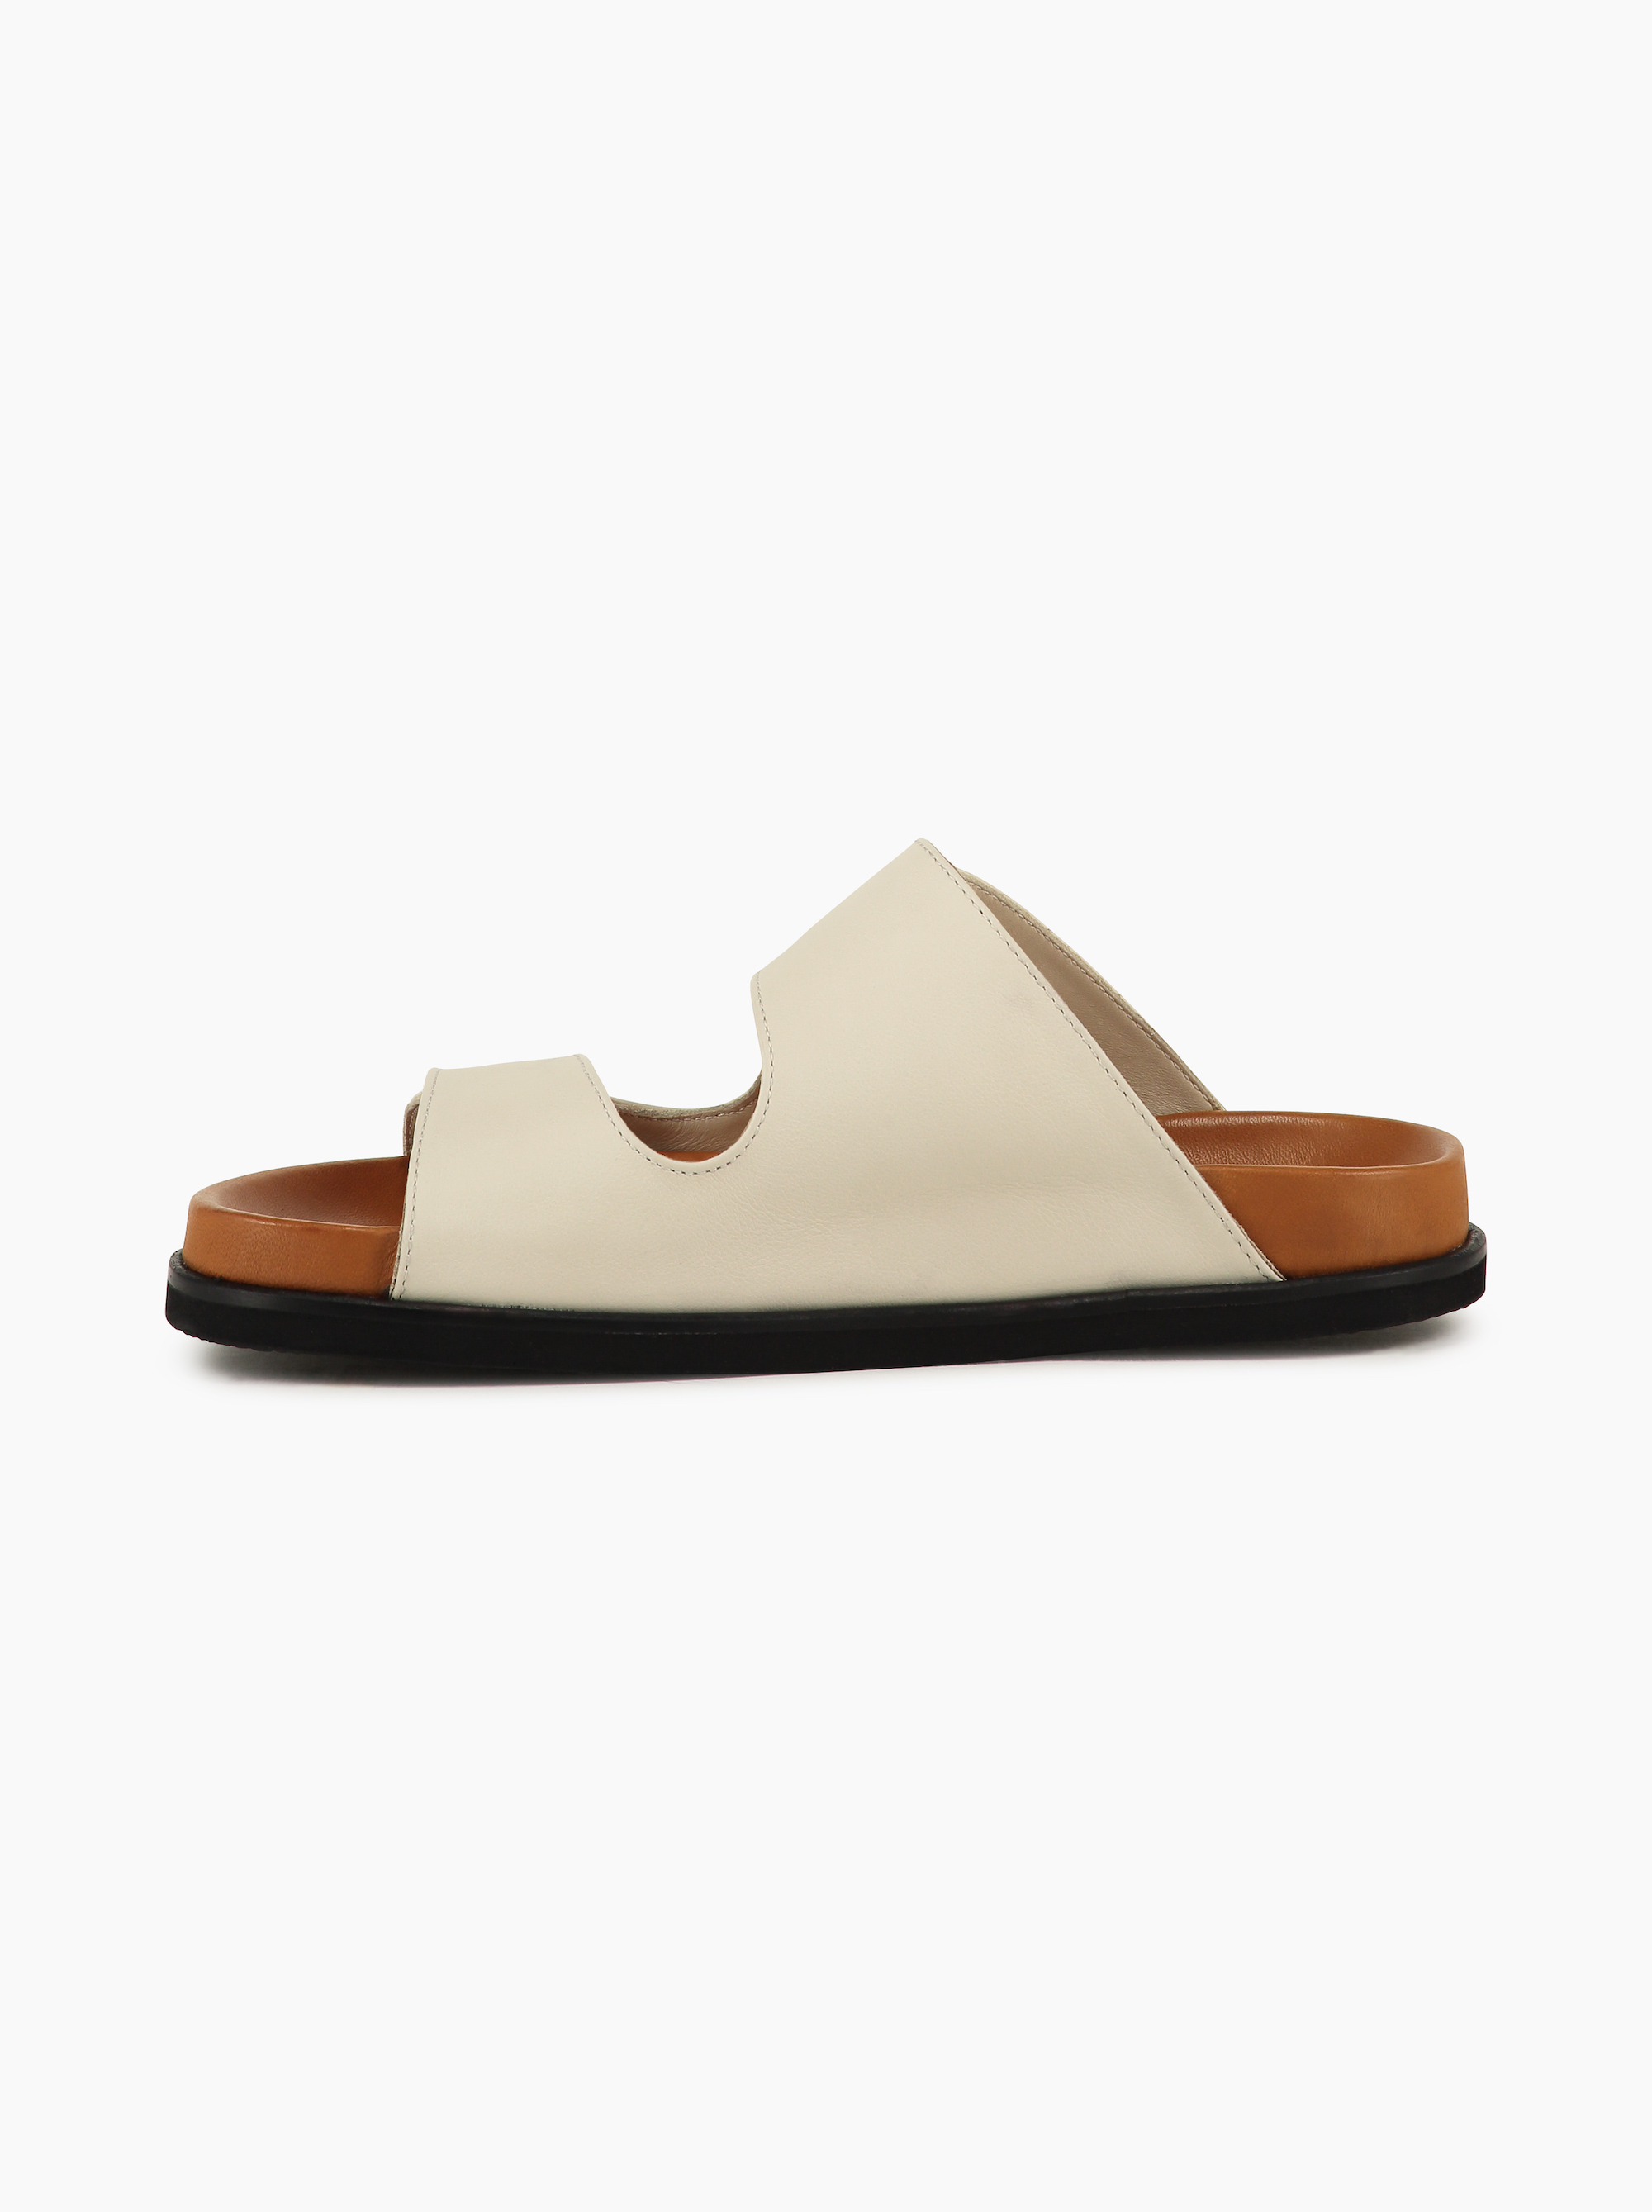 Teym - The Sandal - White - 2b